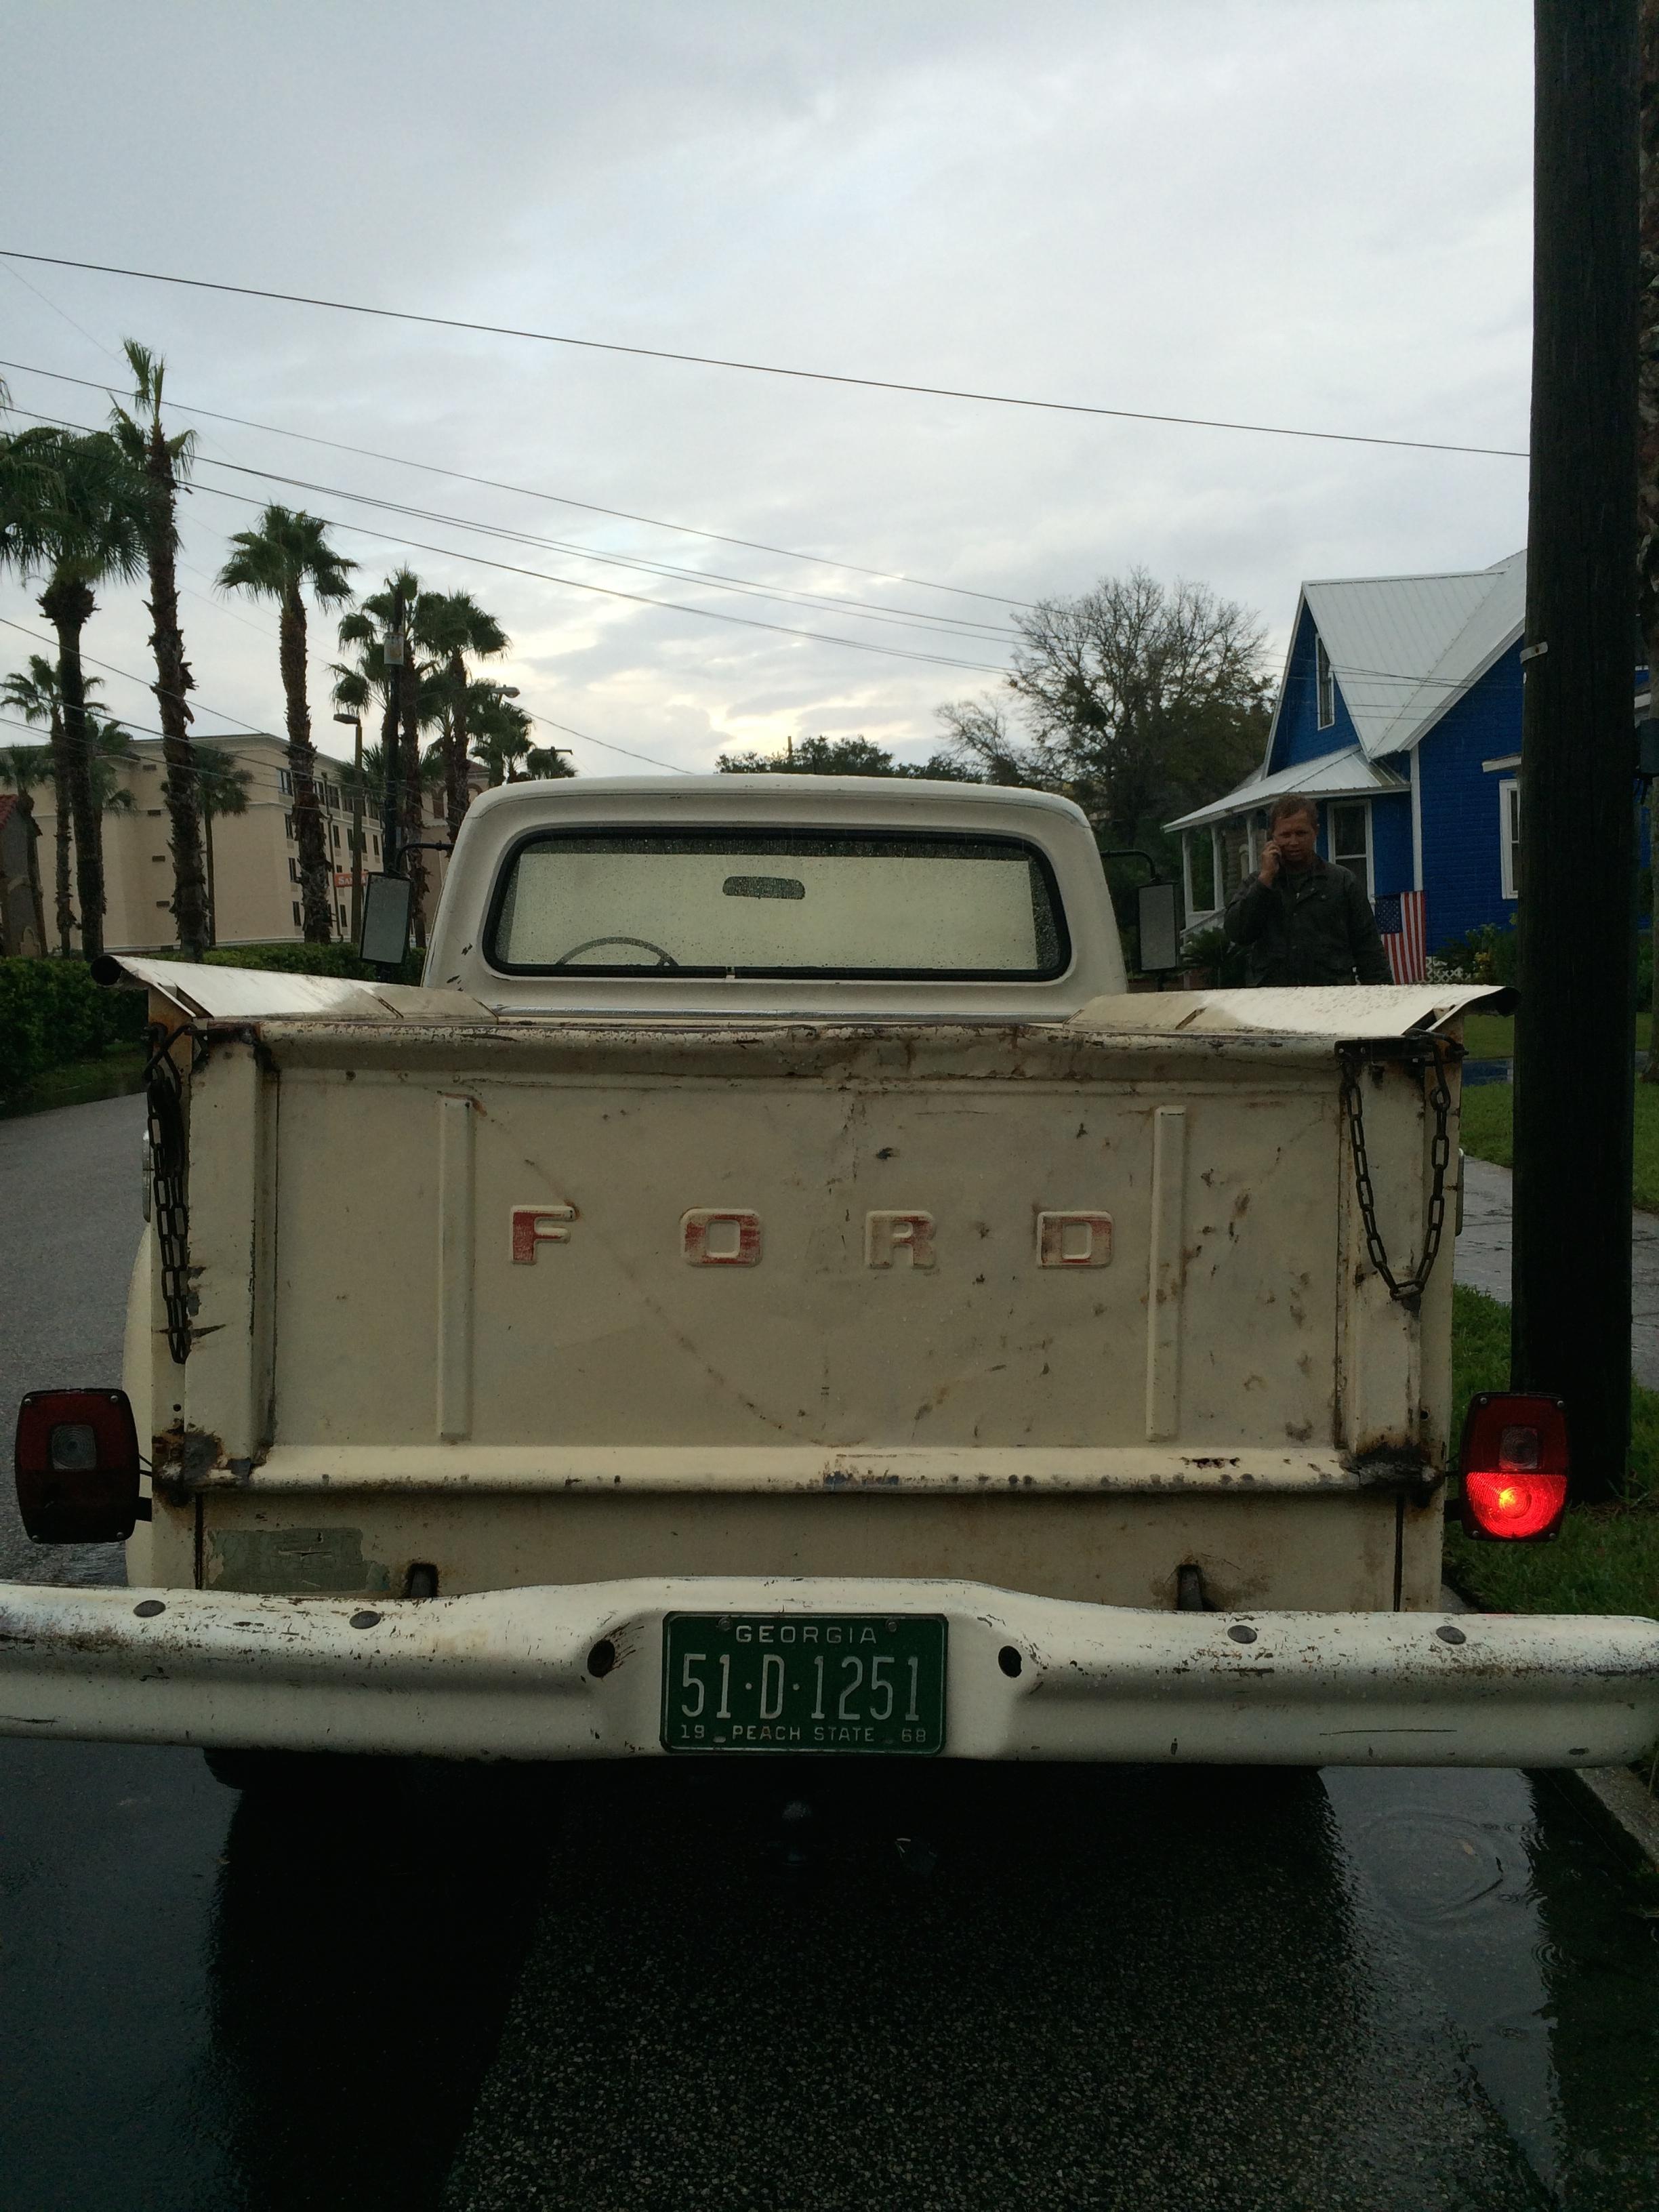 Jon's new truck is here!!!